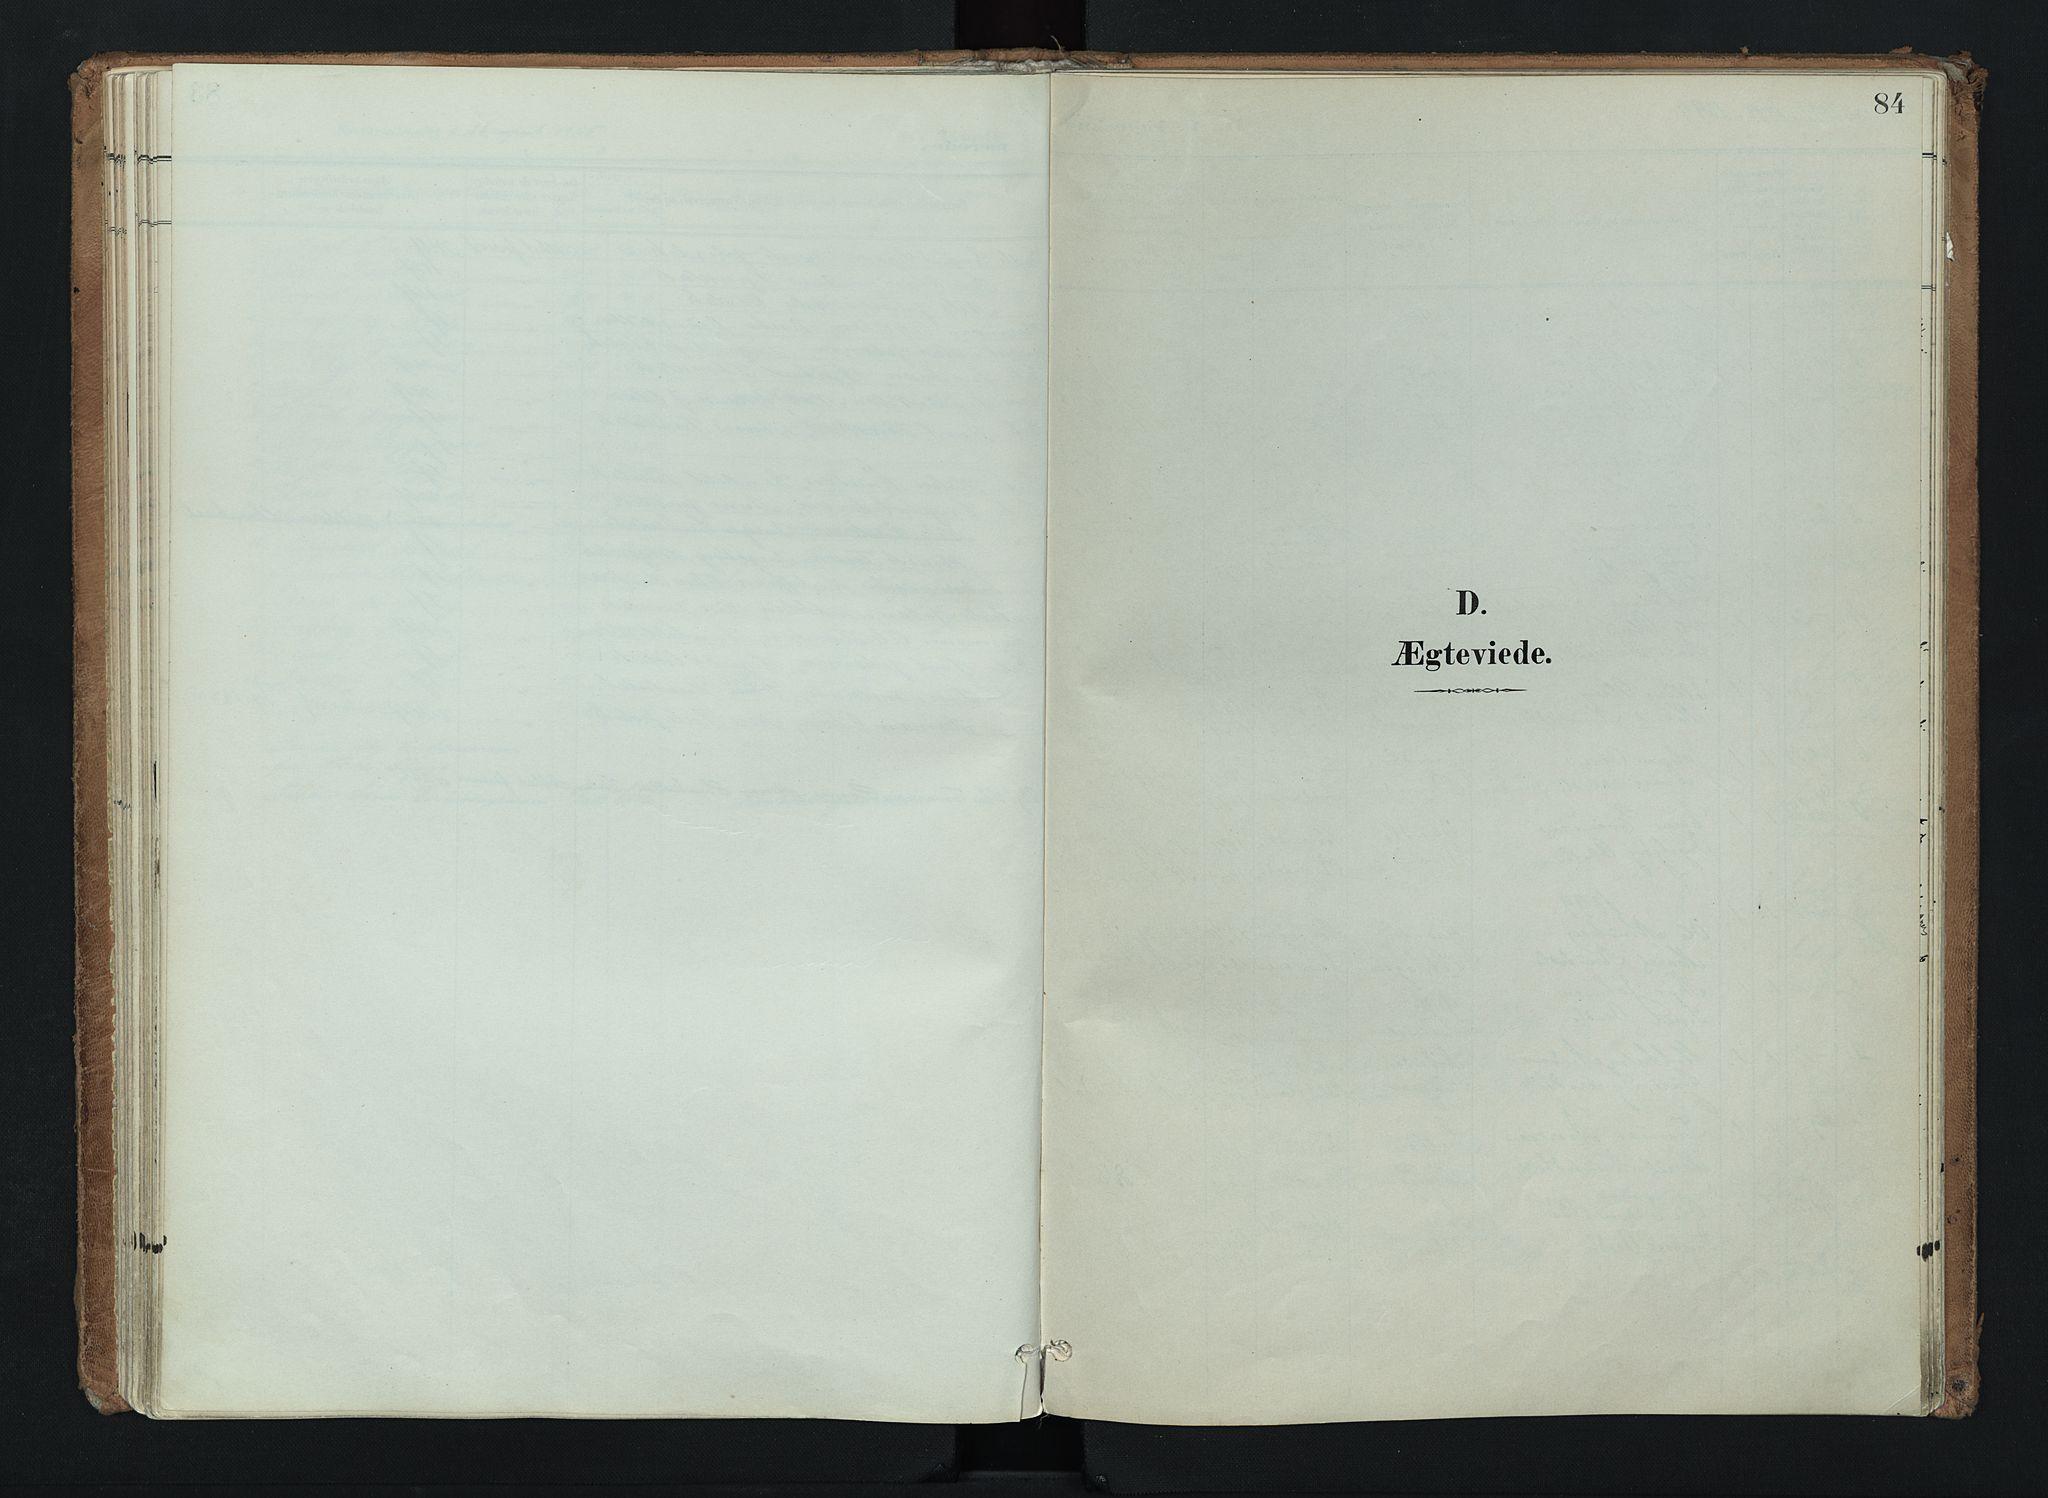 SAH, Nord-Aurdal prestekontor, Ministerialbok nr. 16, 1897-1925, s. 84